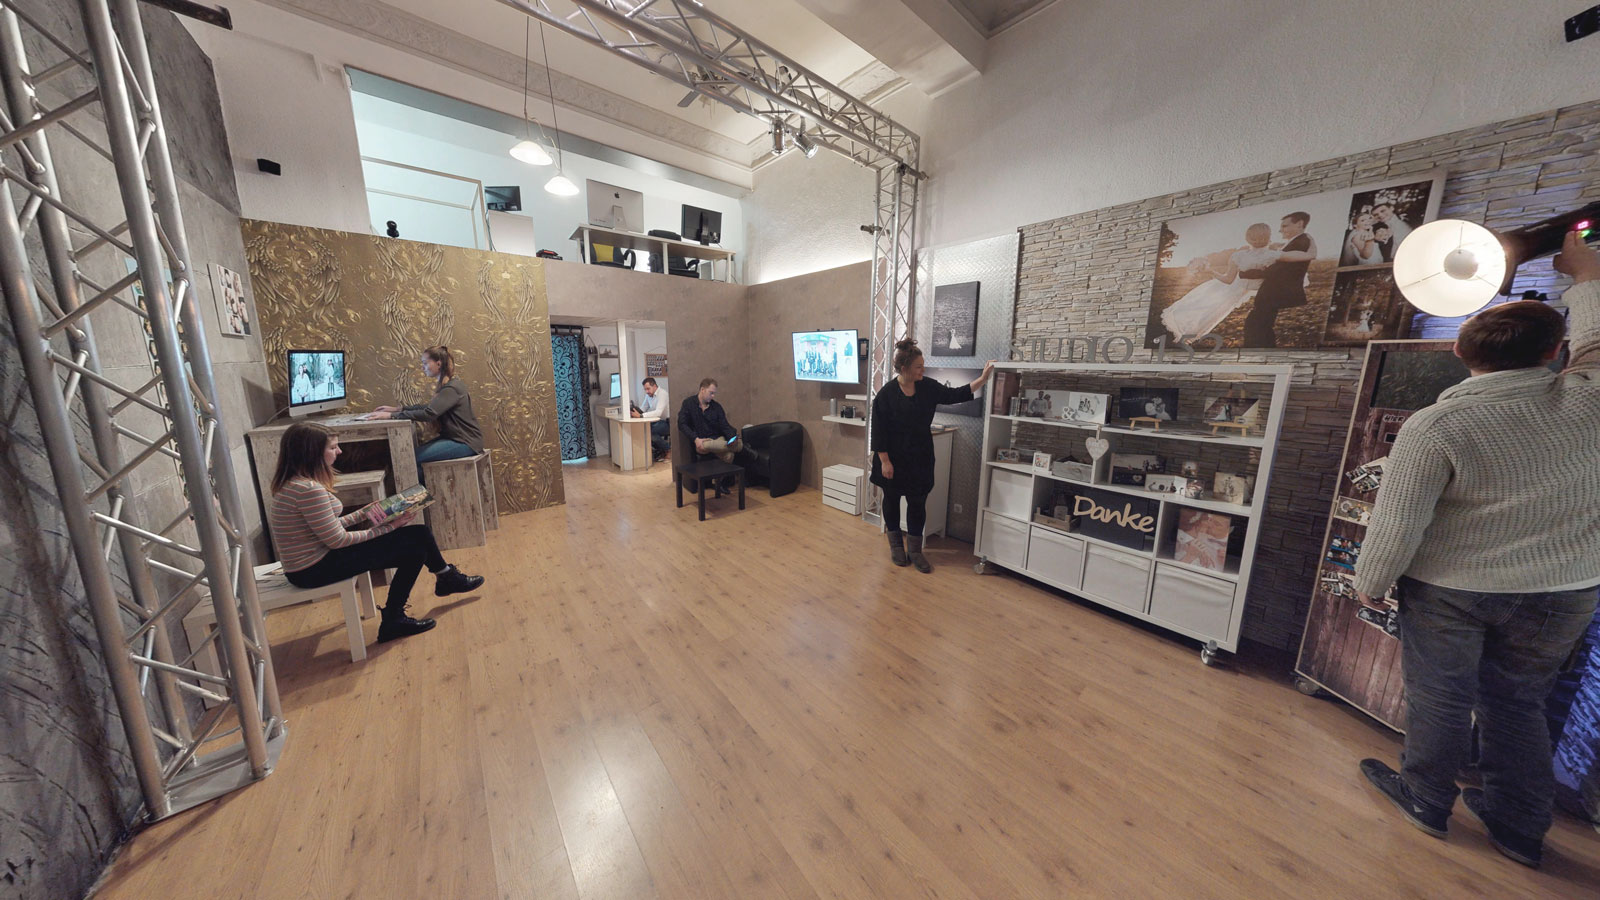 new school photos fotostudio witten ffnungszeiten. Black Bedroom Furniture Sets. Home Design Ideas